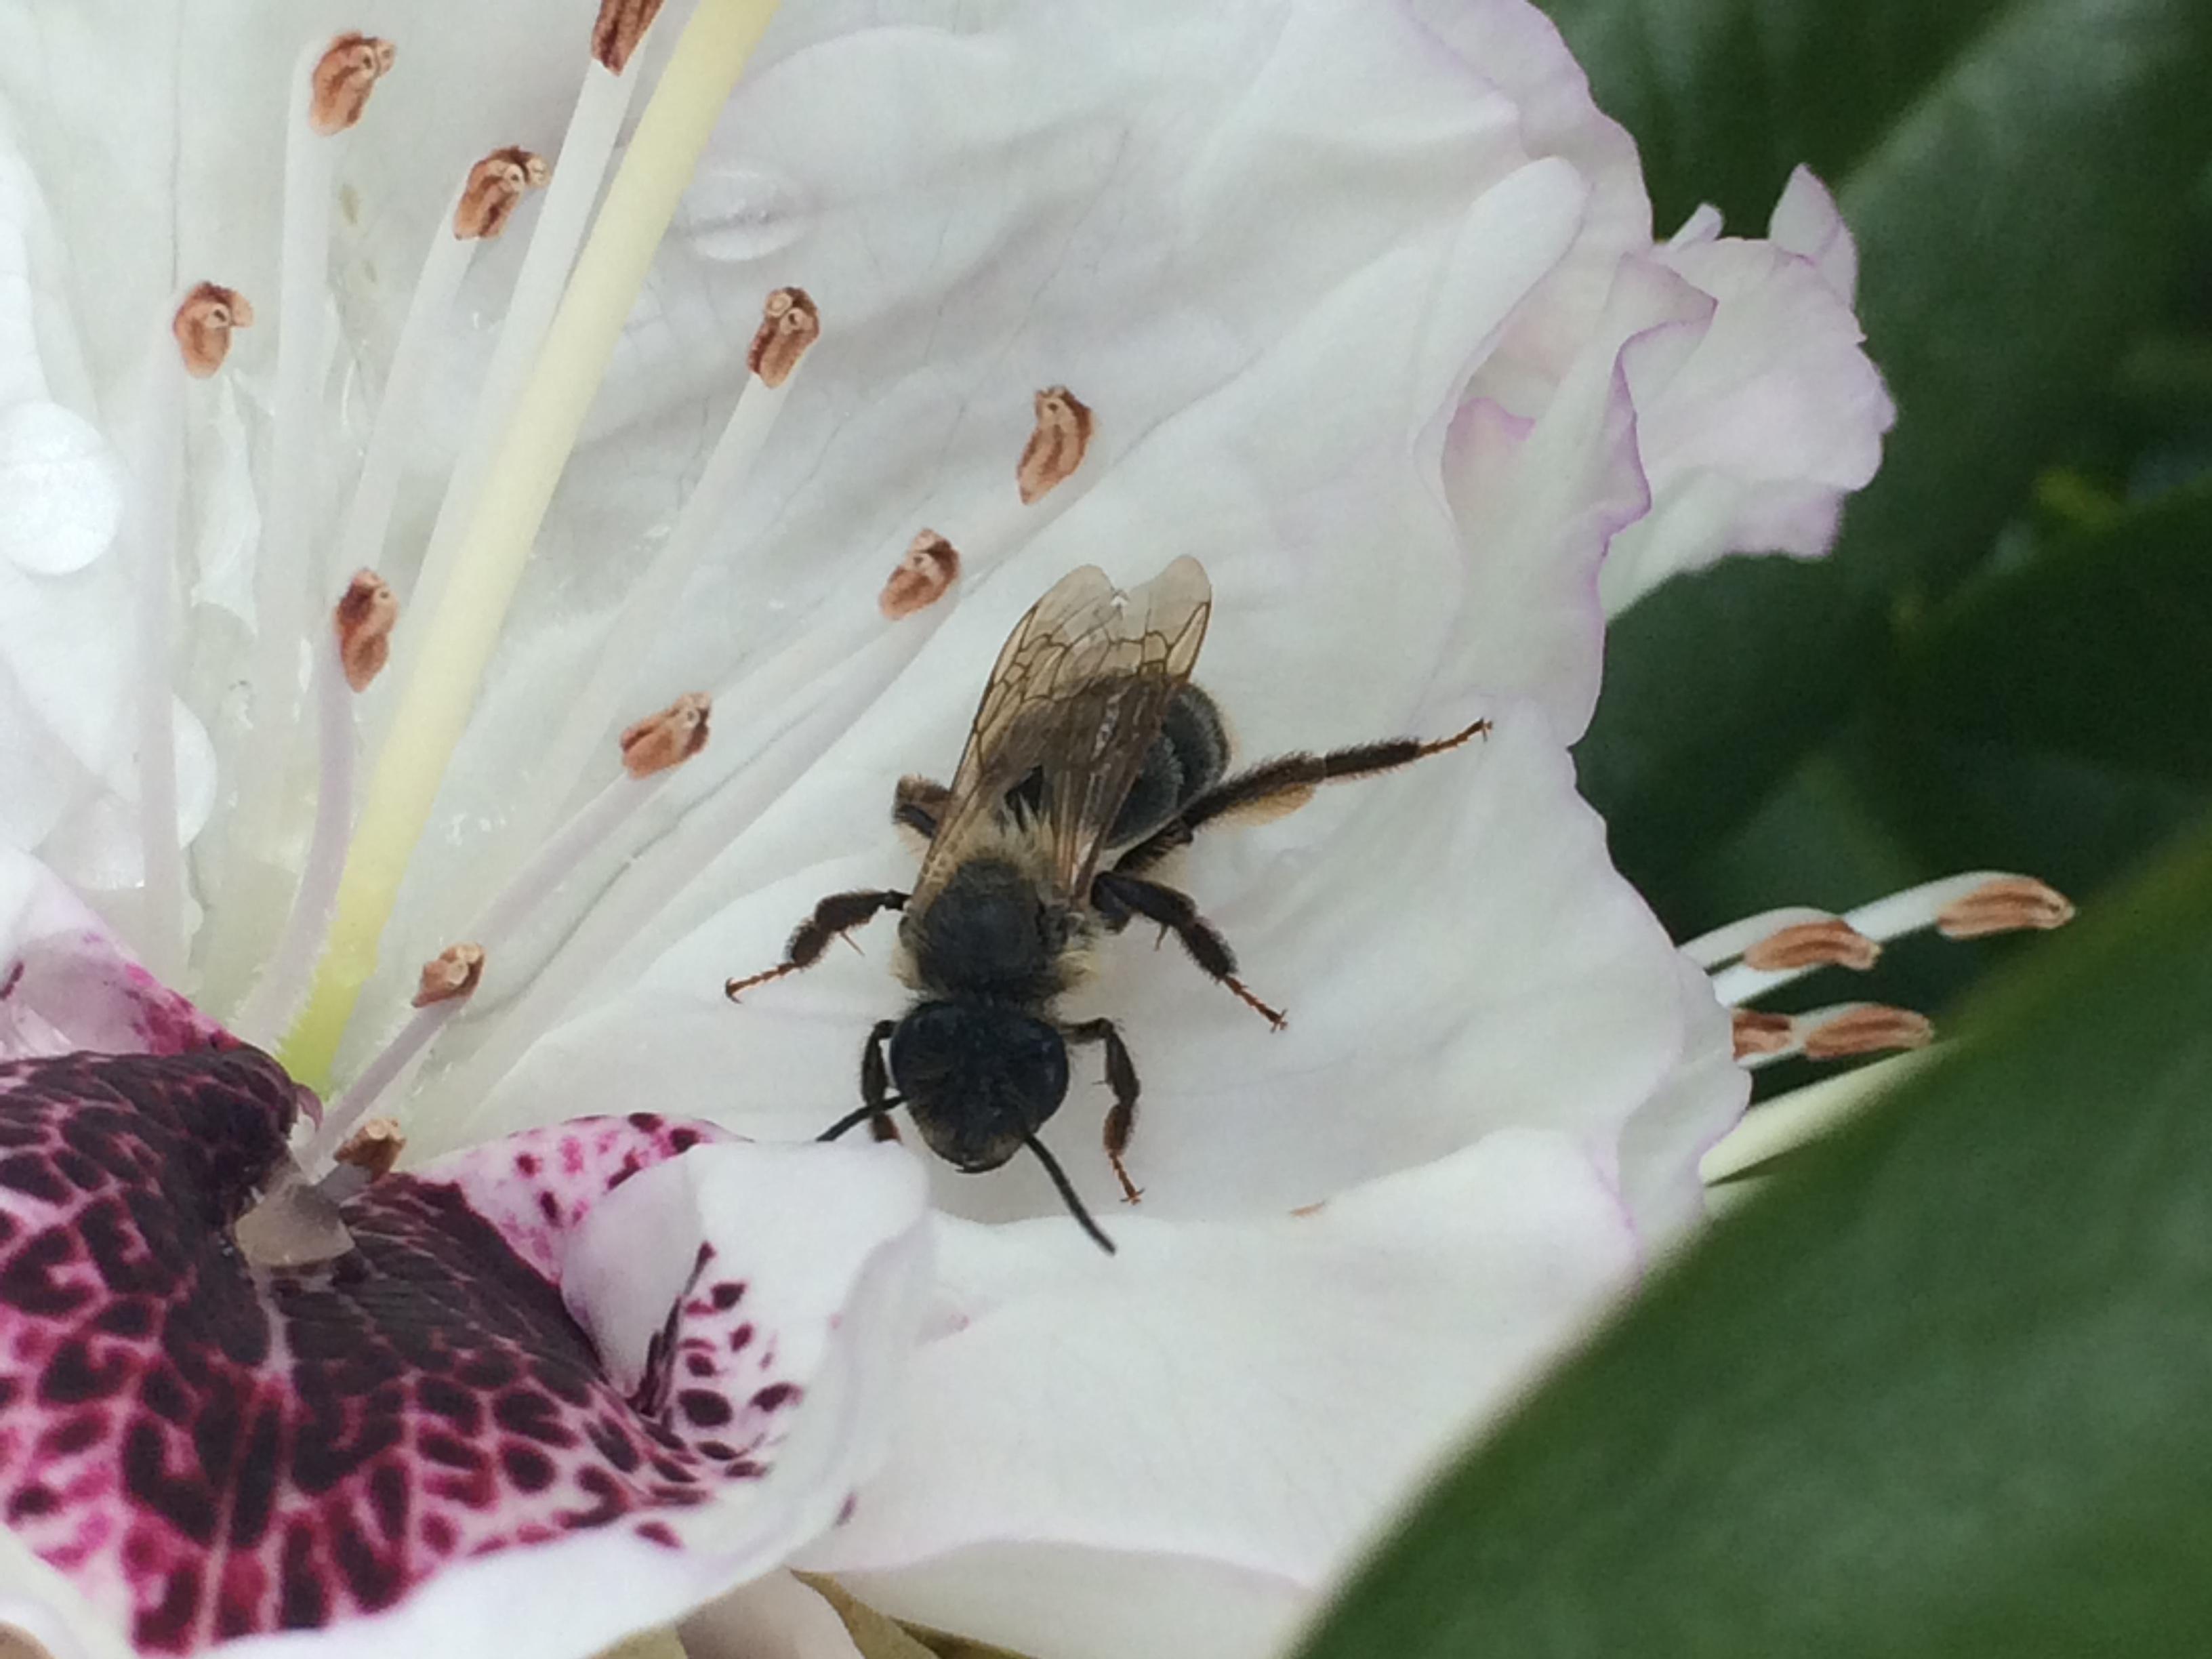 p pini res imbert plantes mellif res indispensables aux pollinisateurs. Black Bedroom Furniture Sets. Home Design Ideas